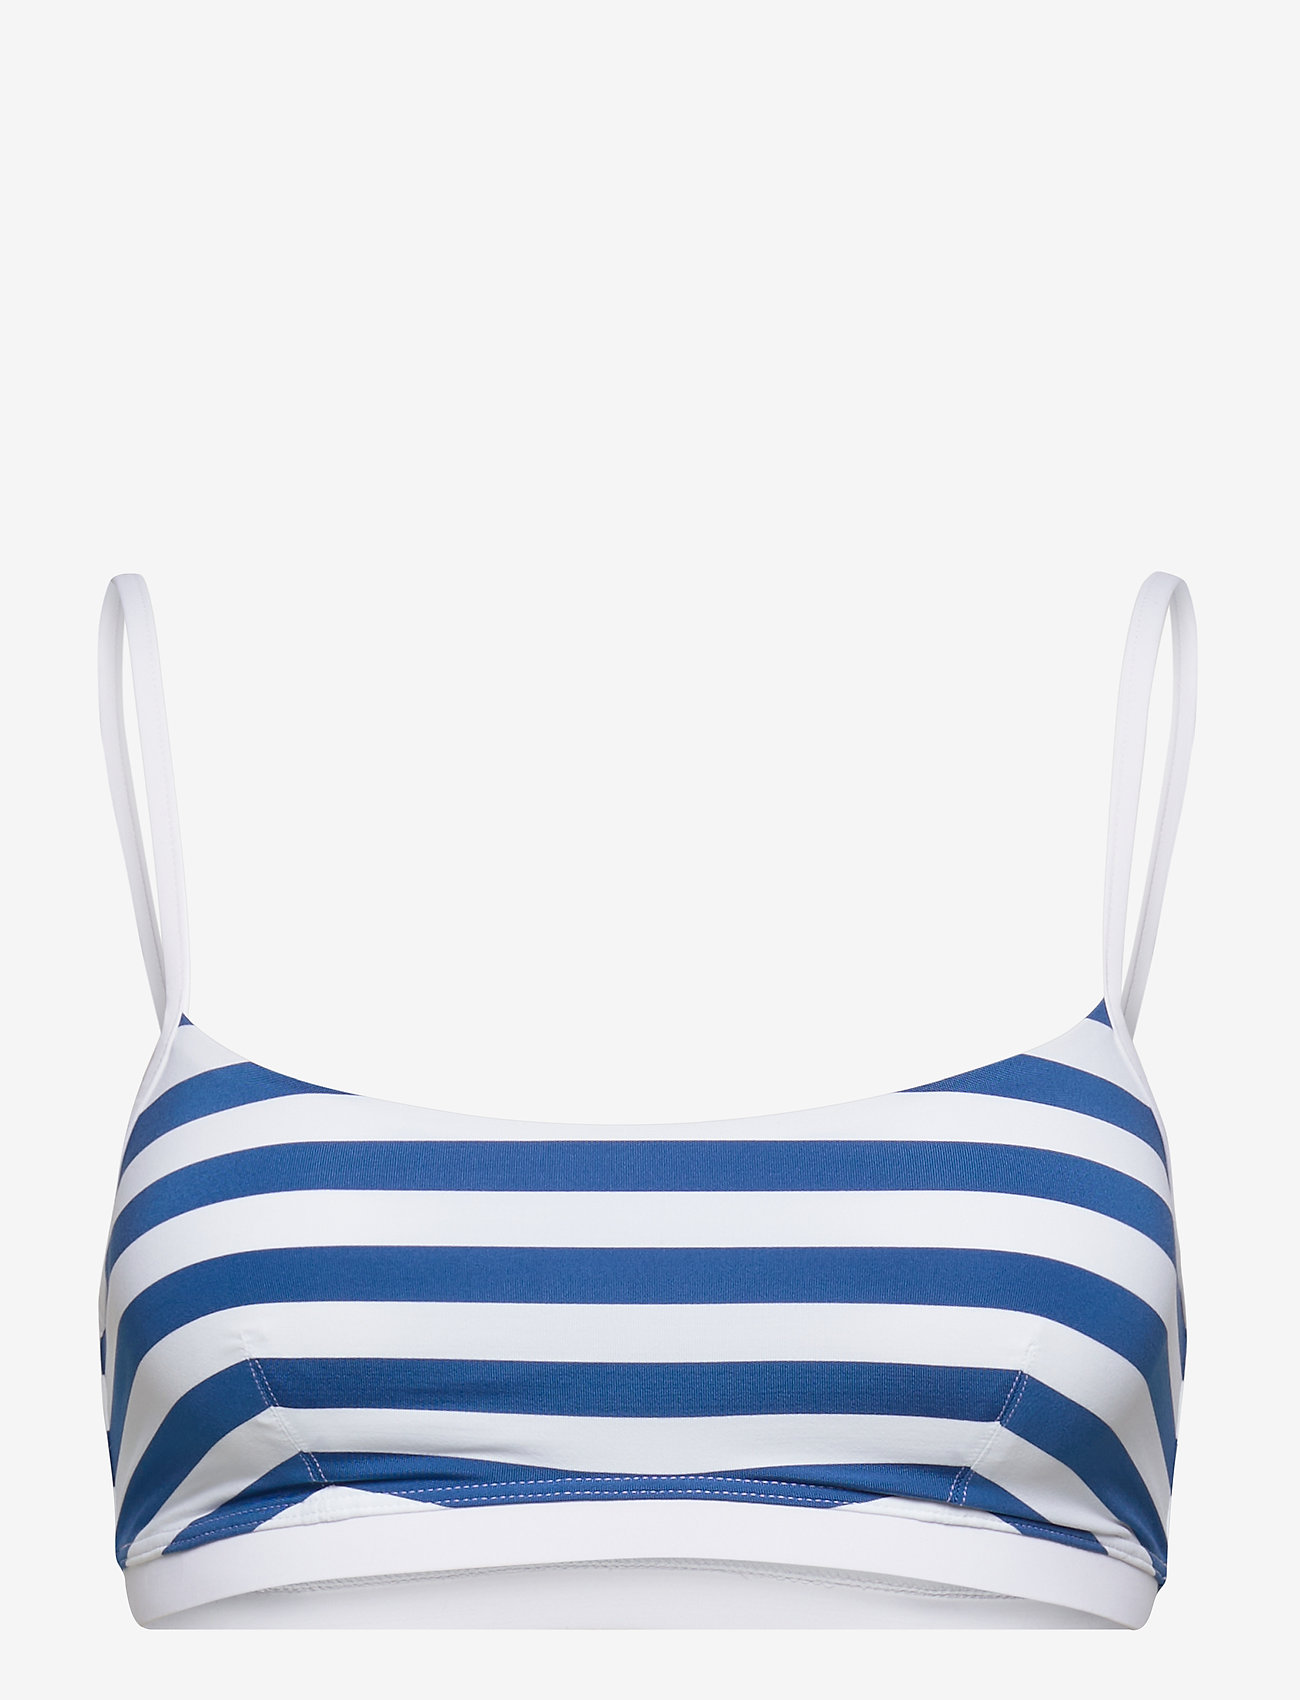 Max Mara Leisure - 1SUPERB - bandeau bikini - white - 0